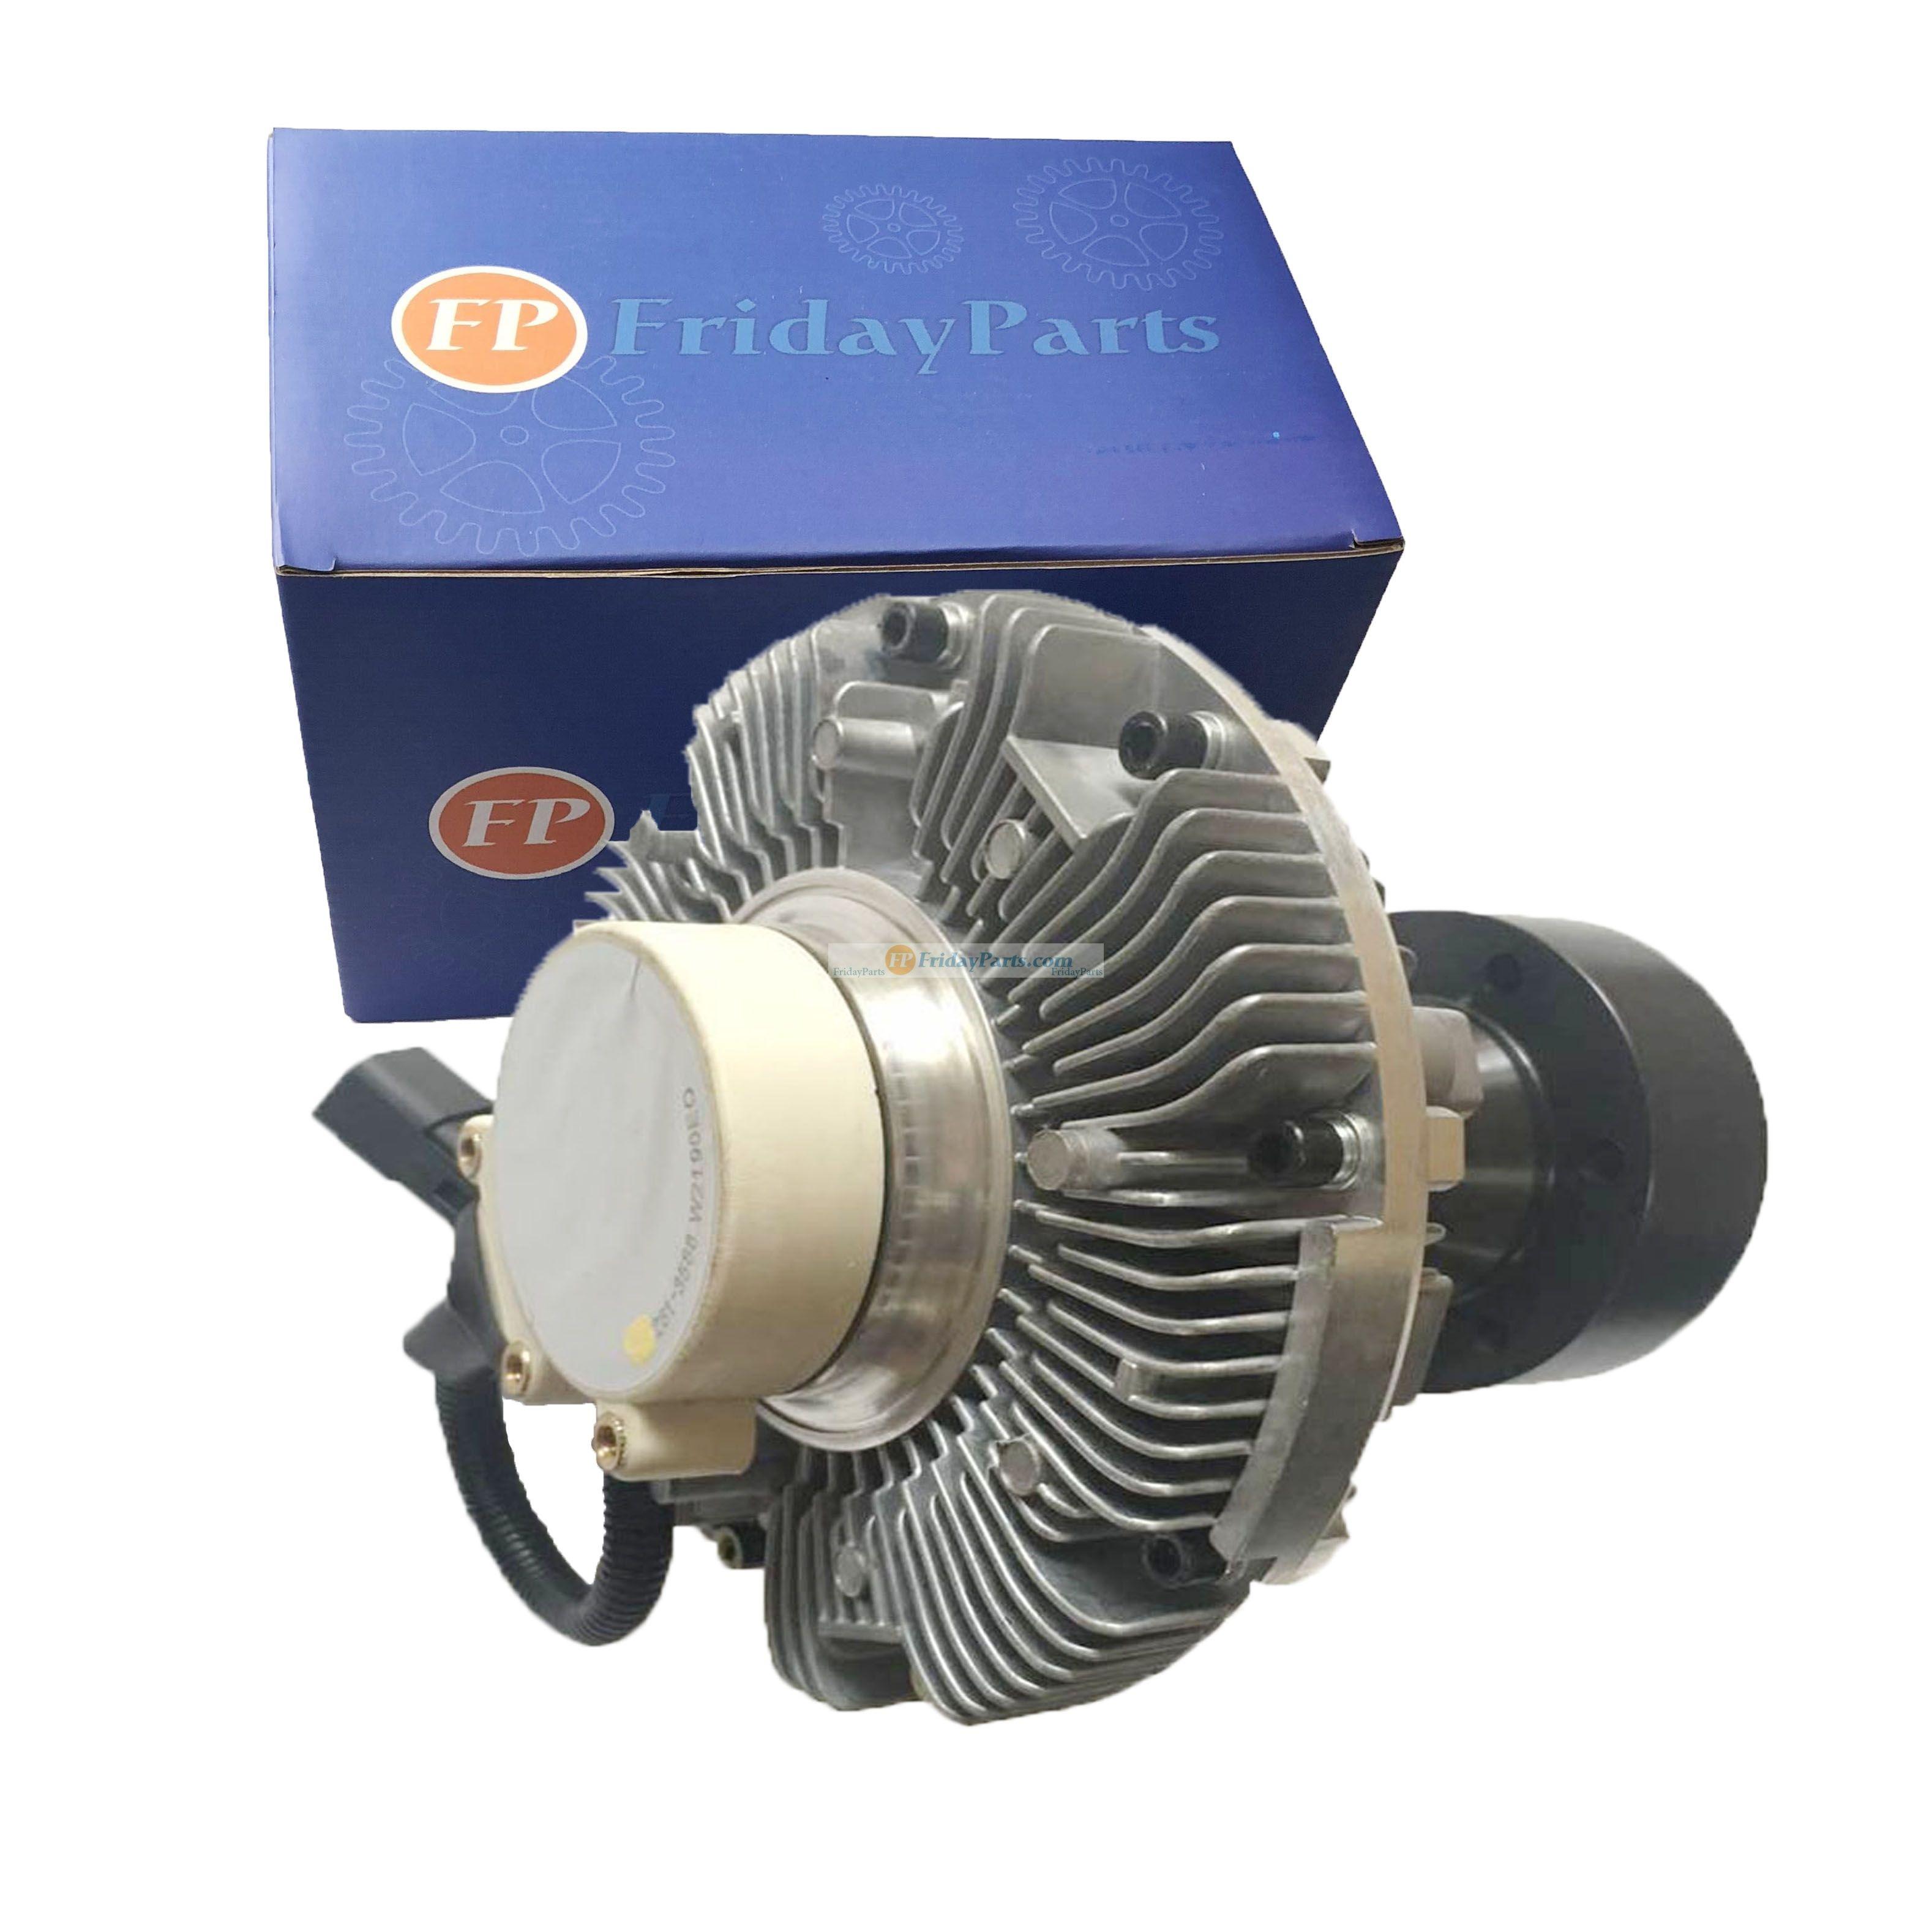 for caterpillar excavator cat 320d 320dl engine 3066 c6 c6 4 fan drive 281 3588